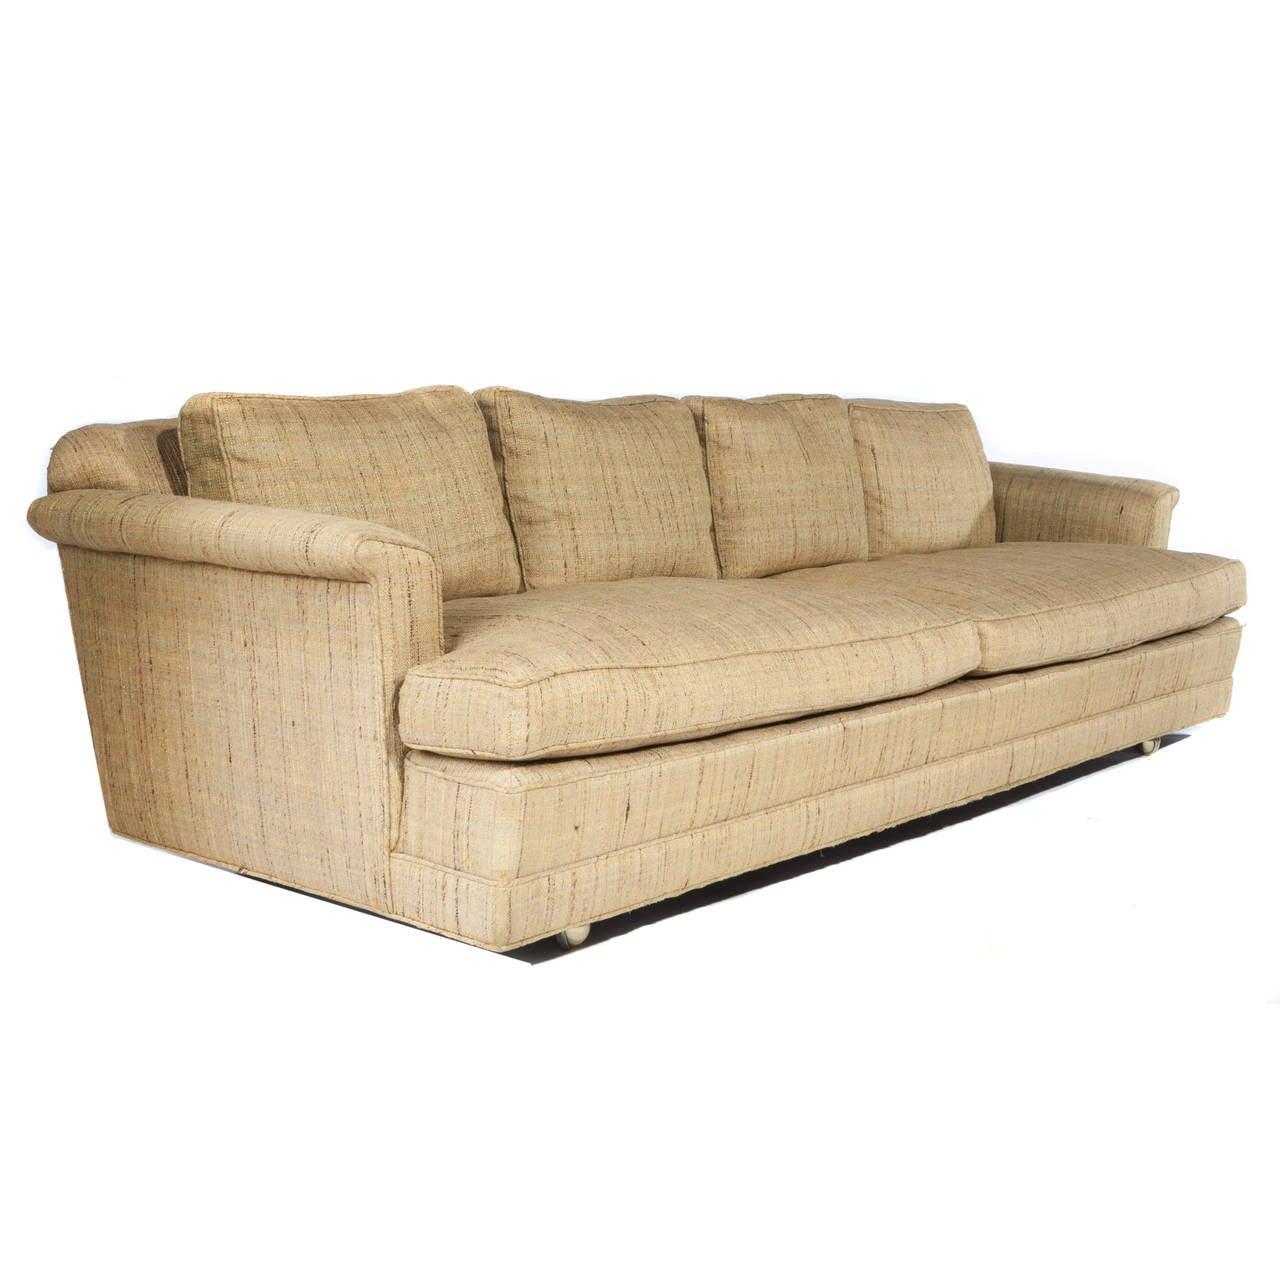 1950s Four-Seat Sofa by Edward Wormley for Dunbar 6